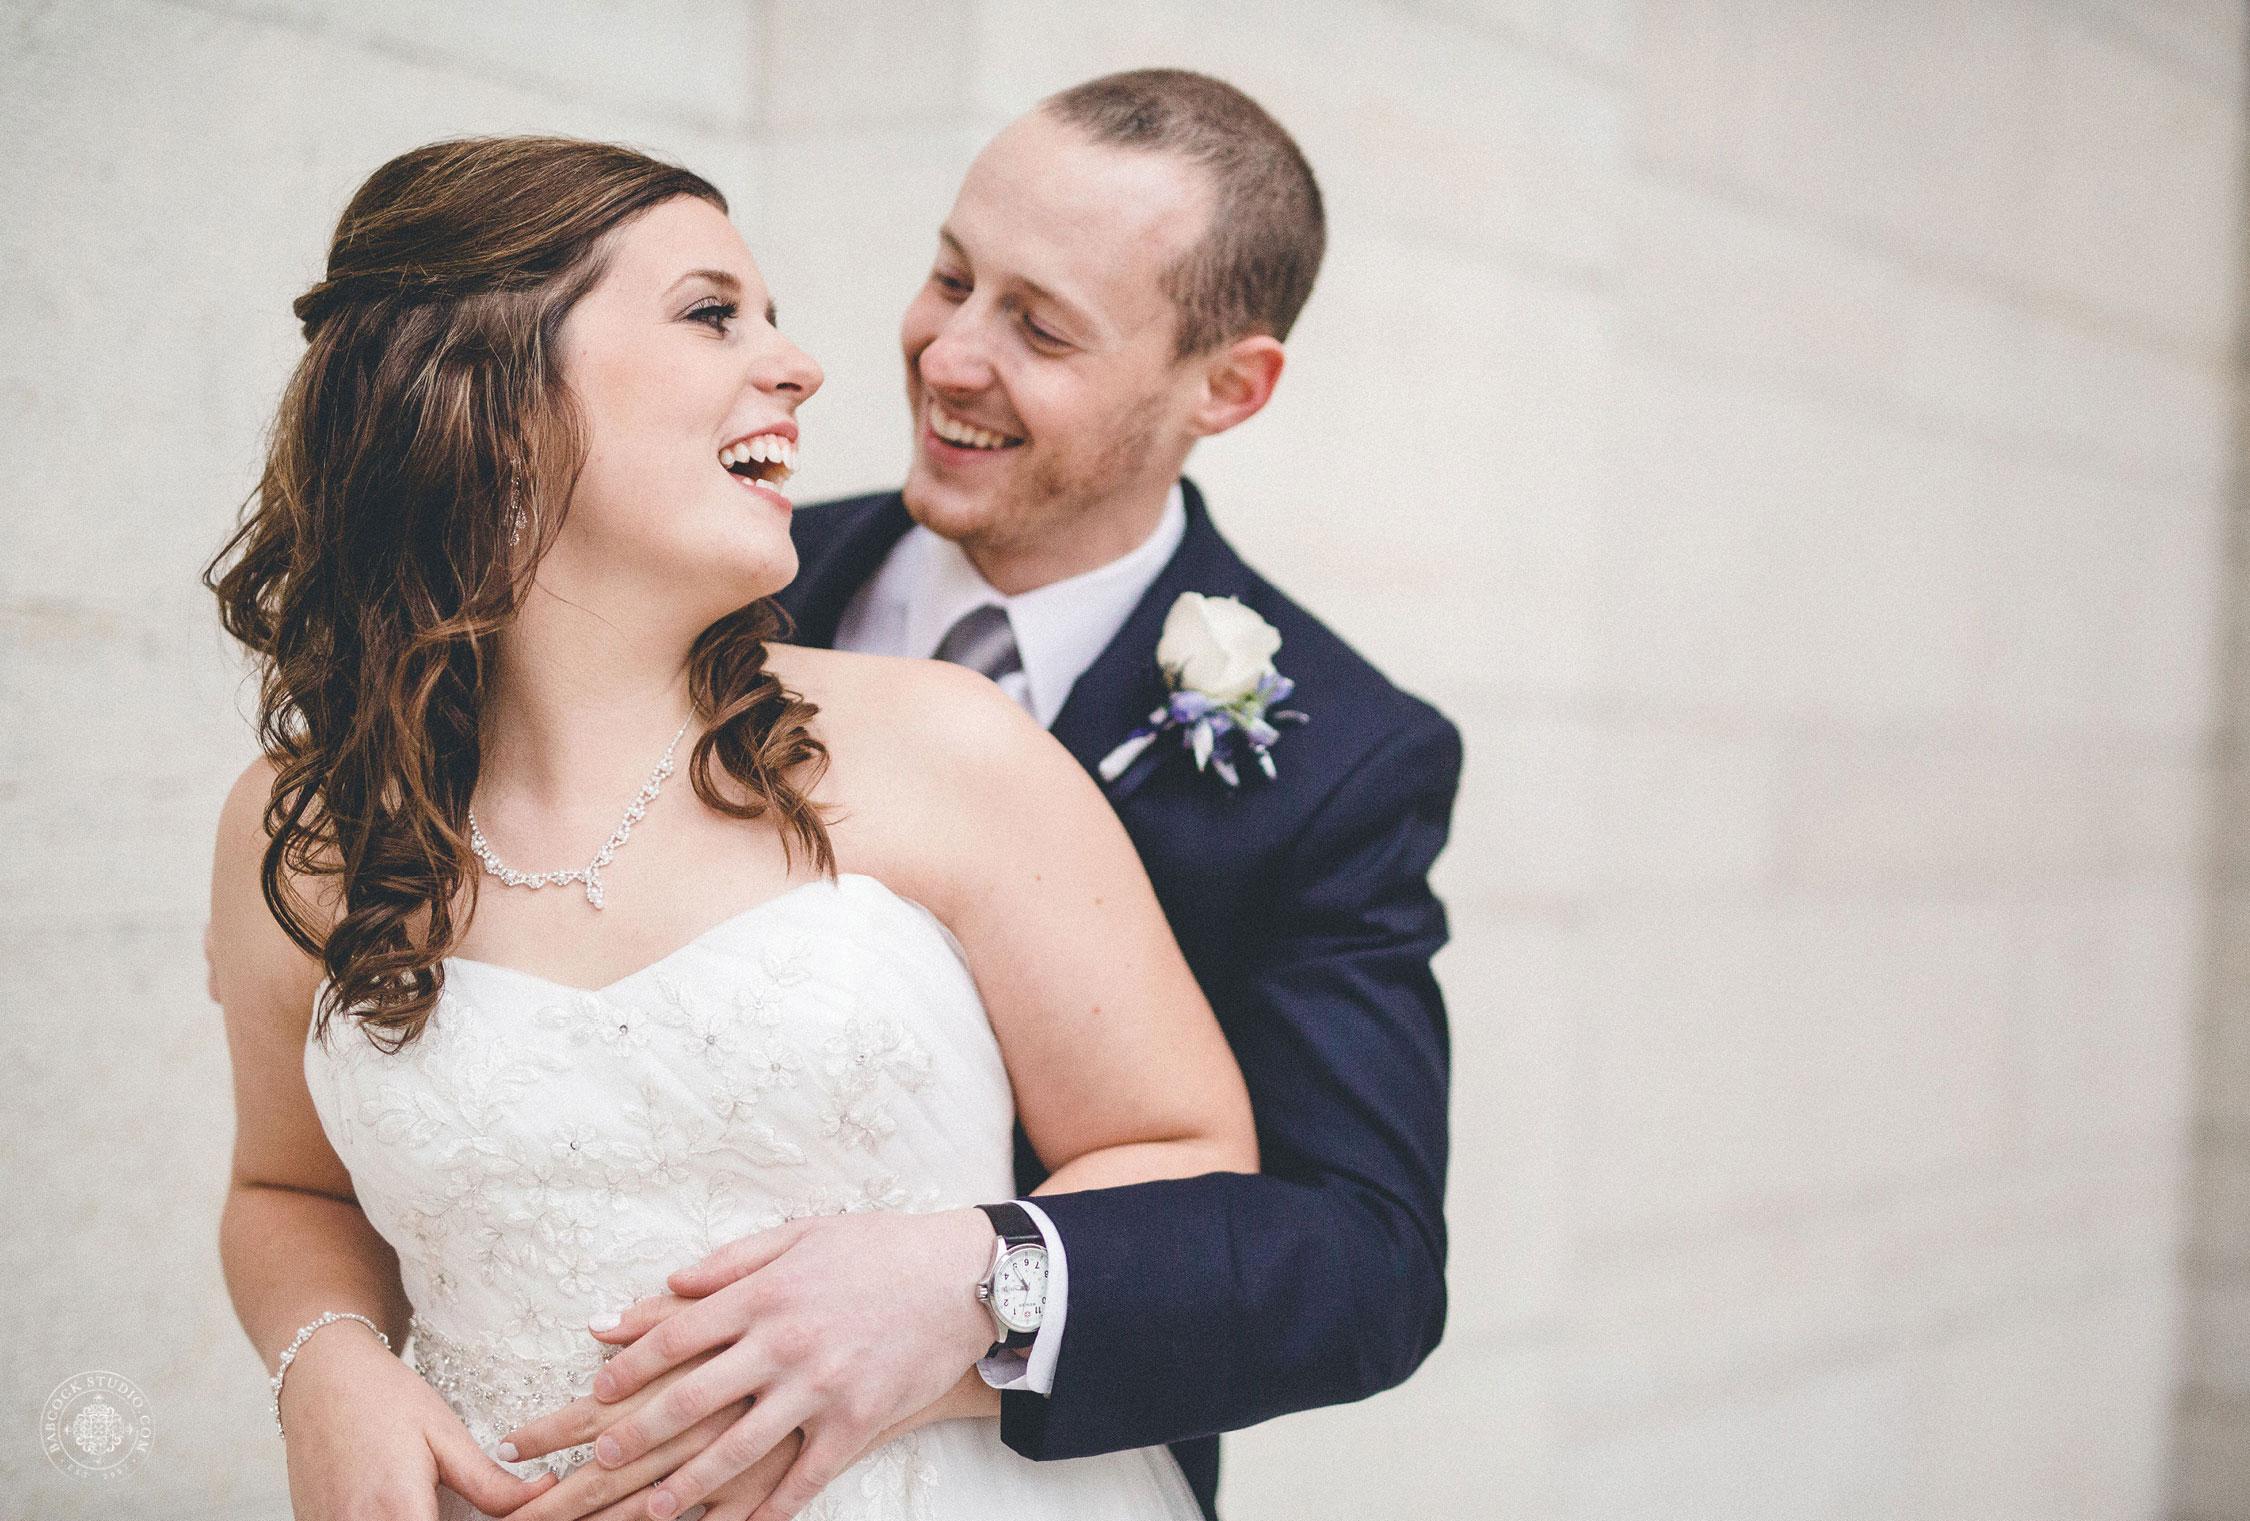 erica-nick-wedding-photographer-dayton-ohio-6.jpg